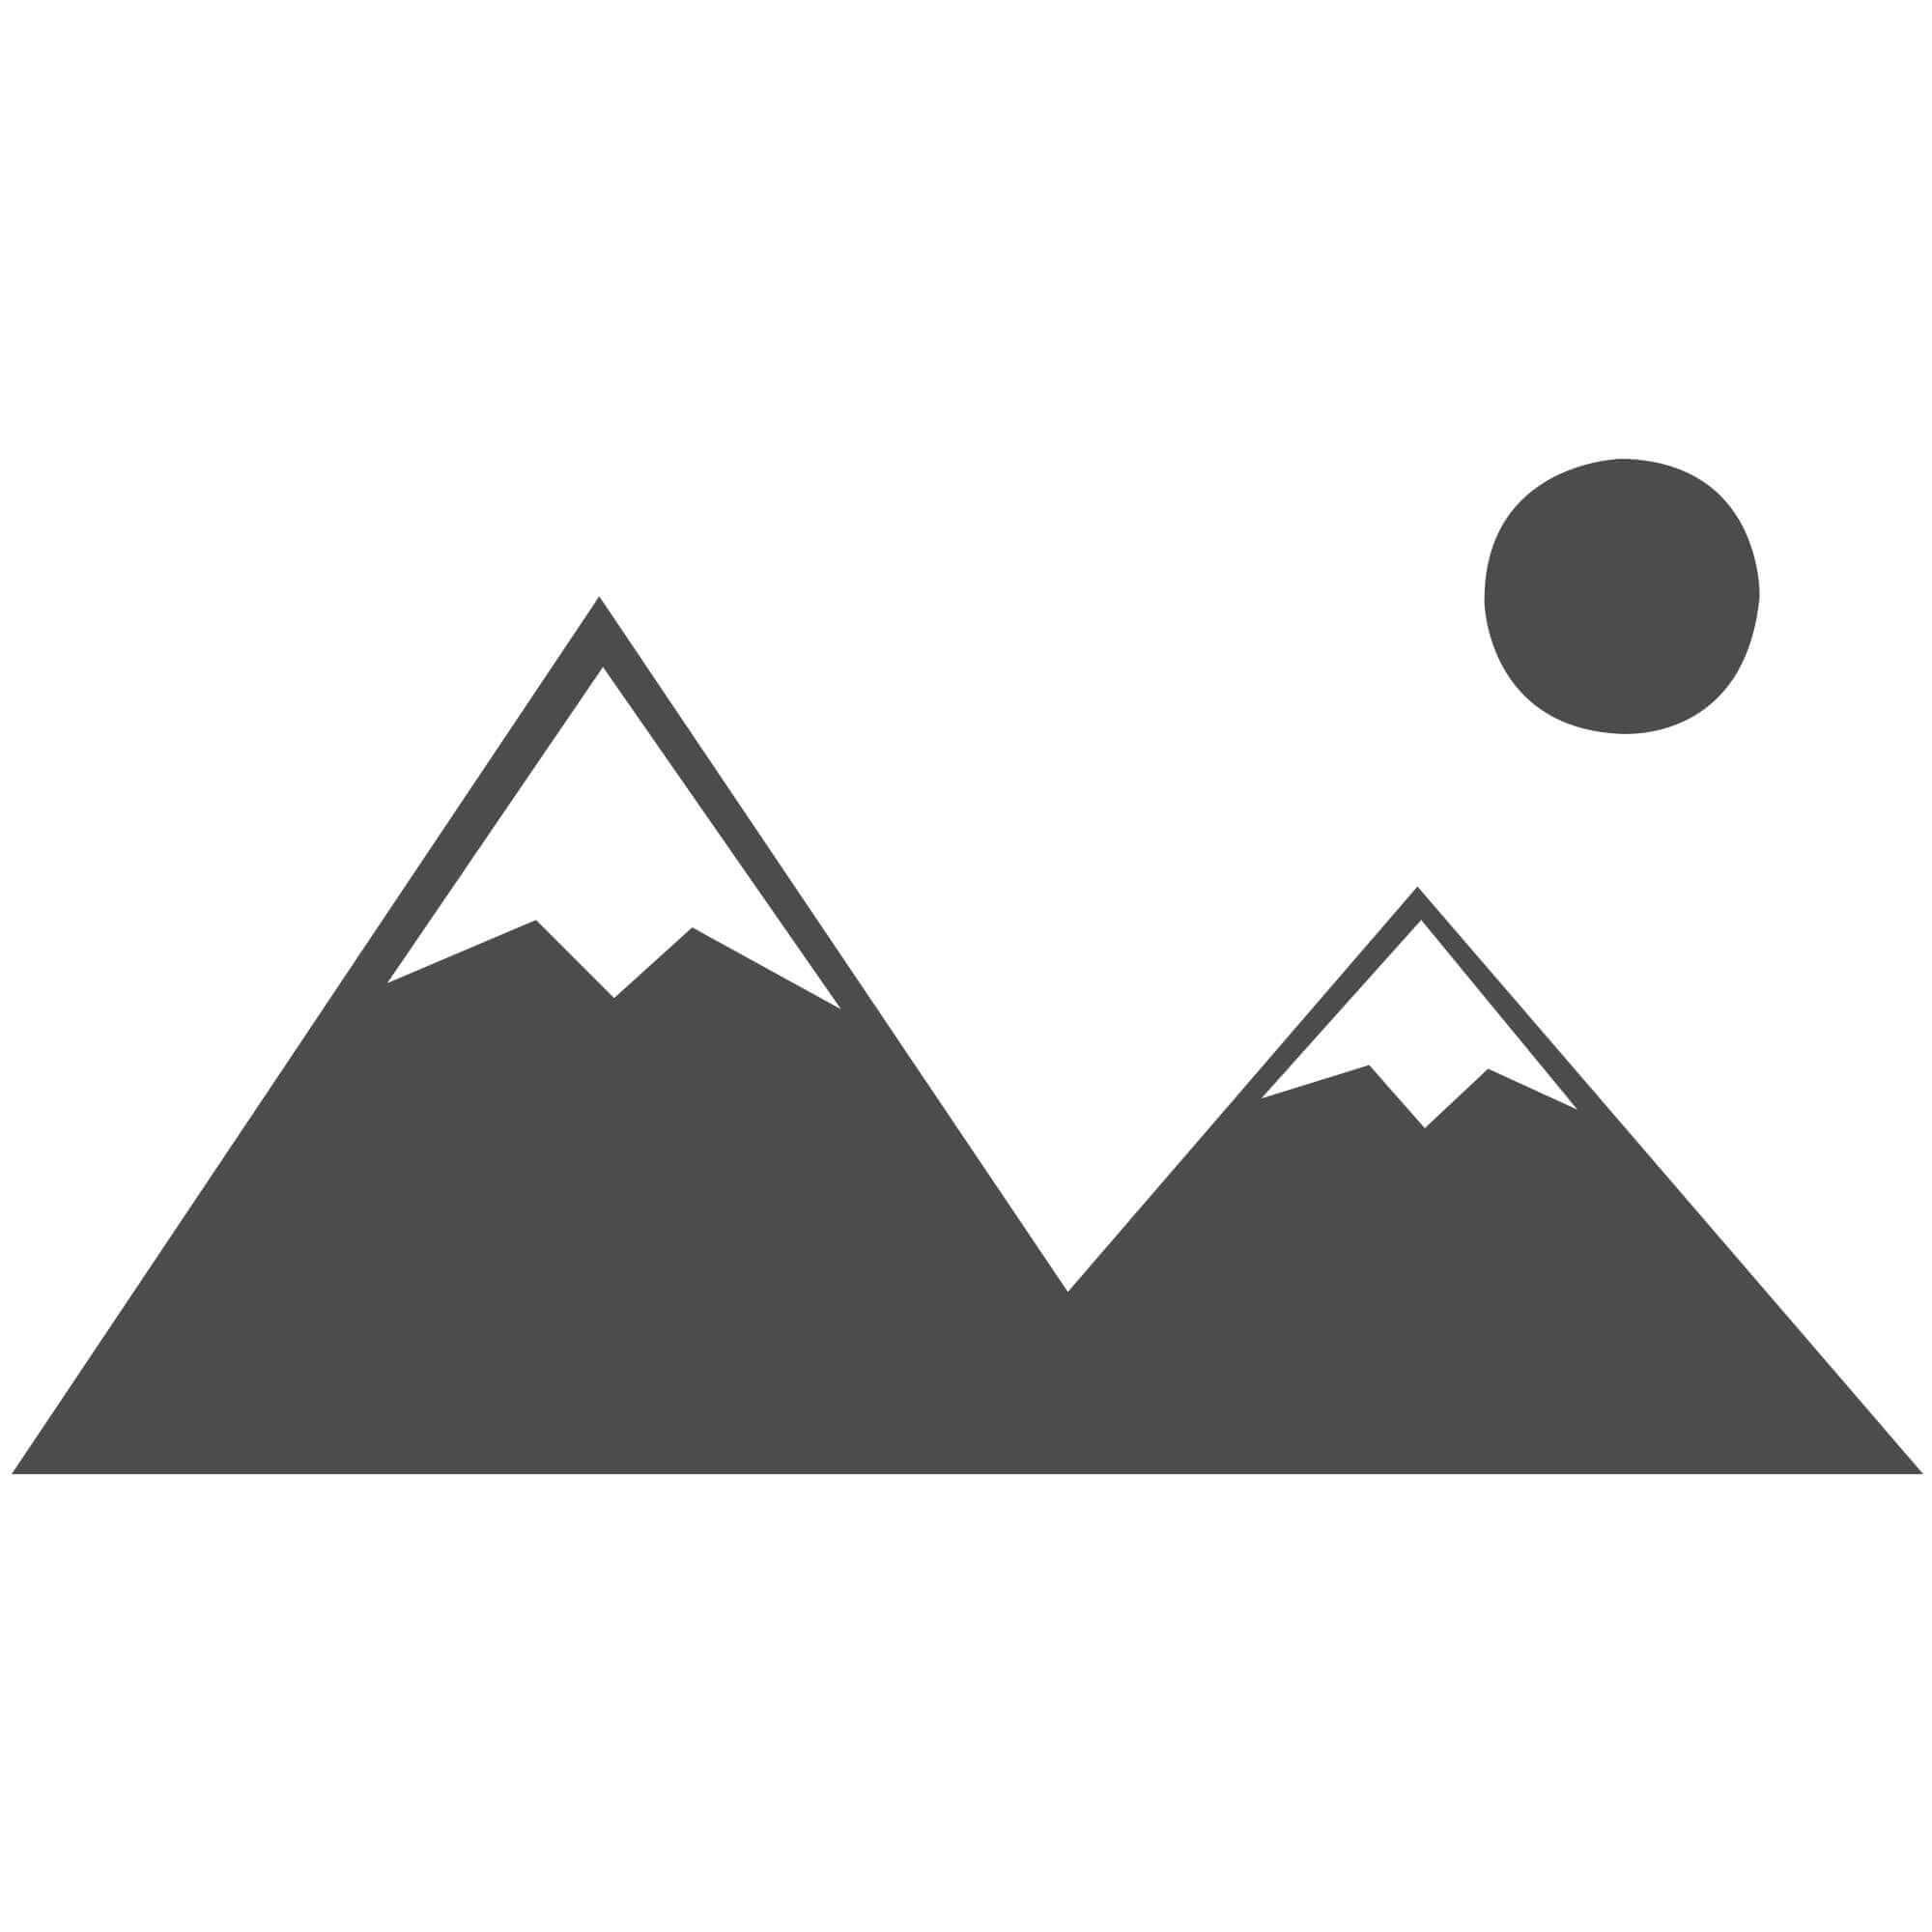 "Solitaire Daria Grey Rug - Size 120 x 170 cm (4' x 5'7"")"